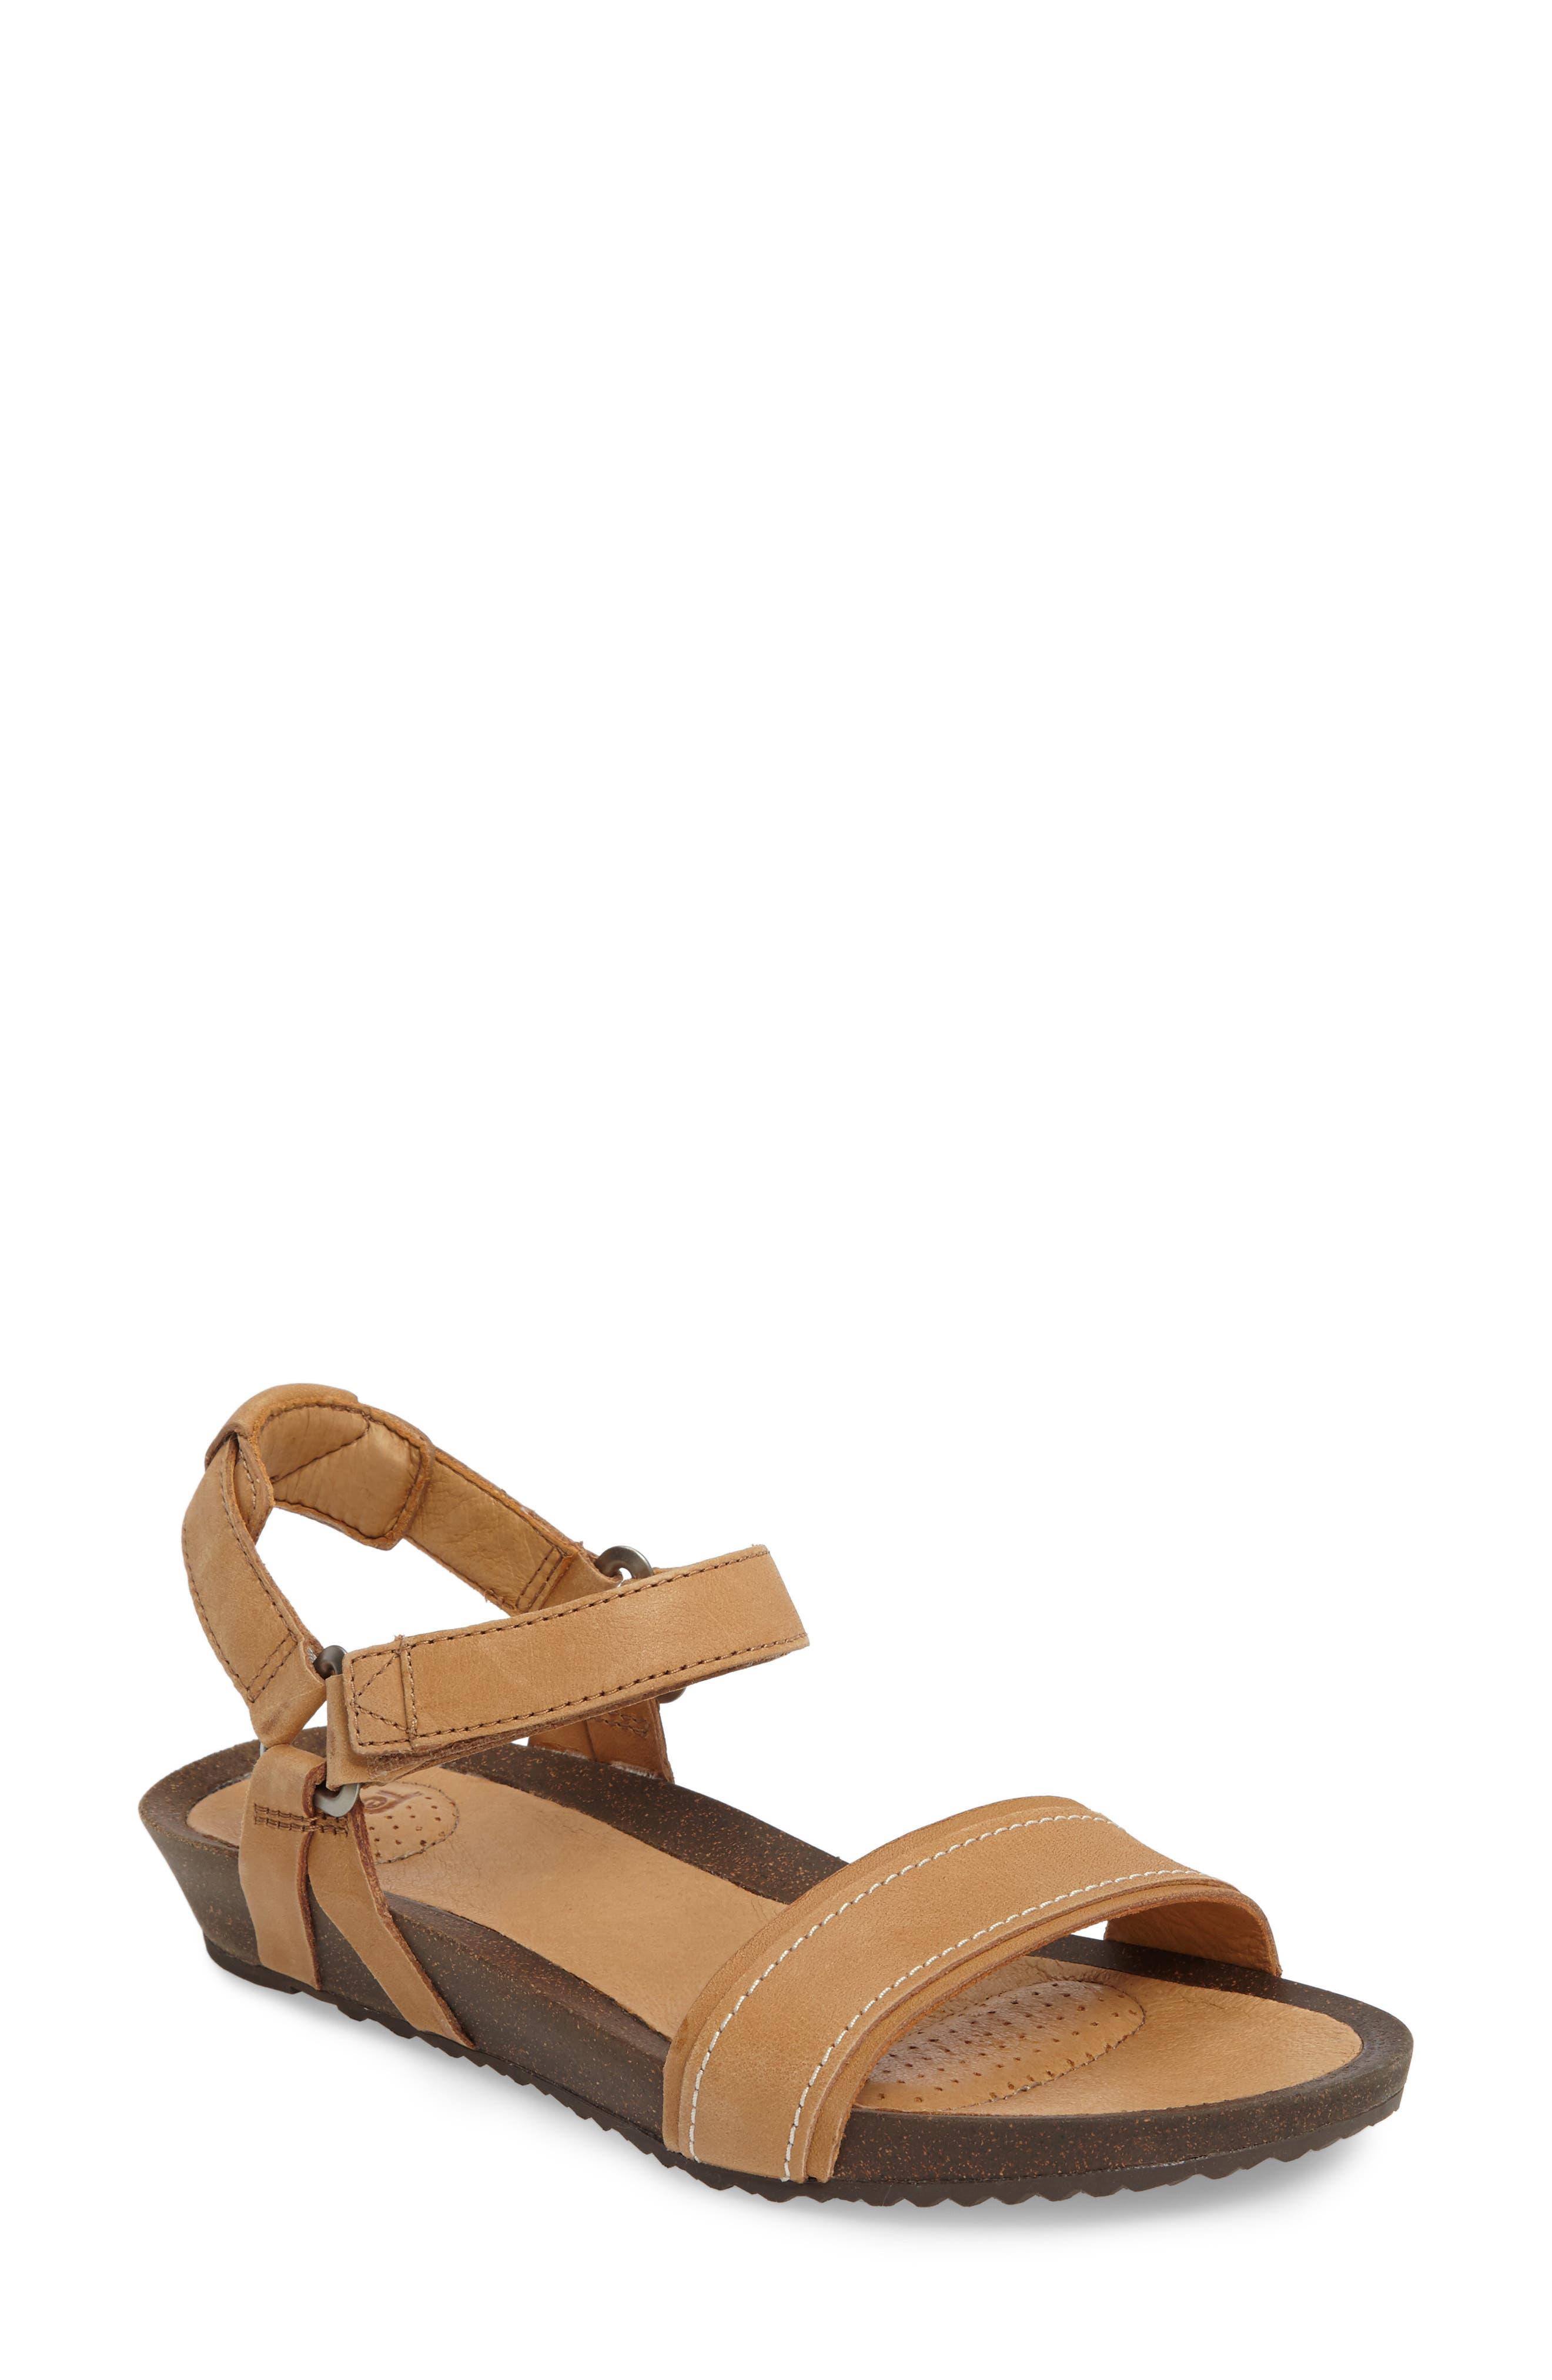 Ysidro Stitch Sandal,                         Main,                         color, Tan Leather